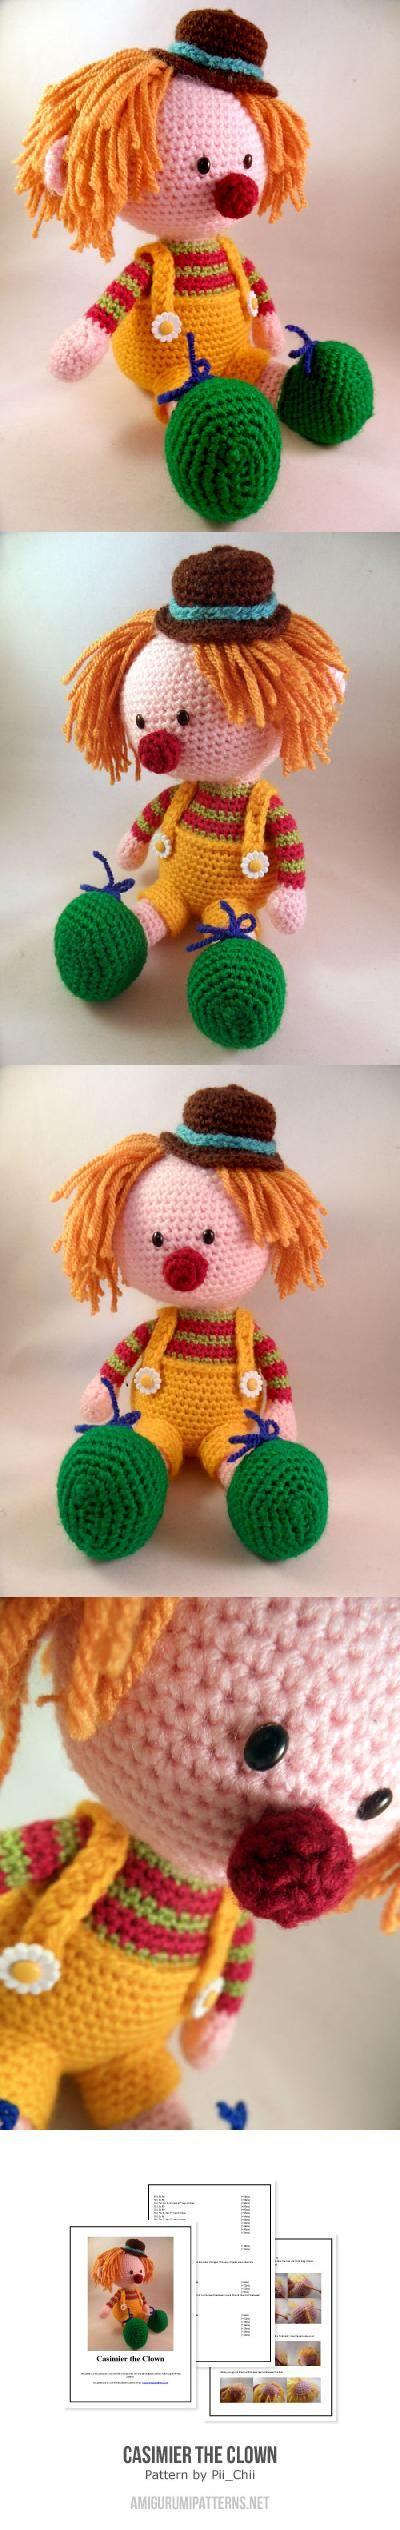 25+ best ideas about The clown on Pinterest It the clown ...